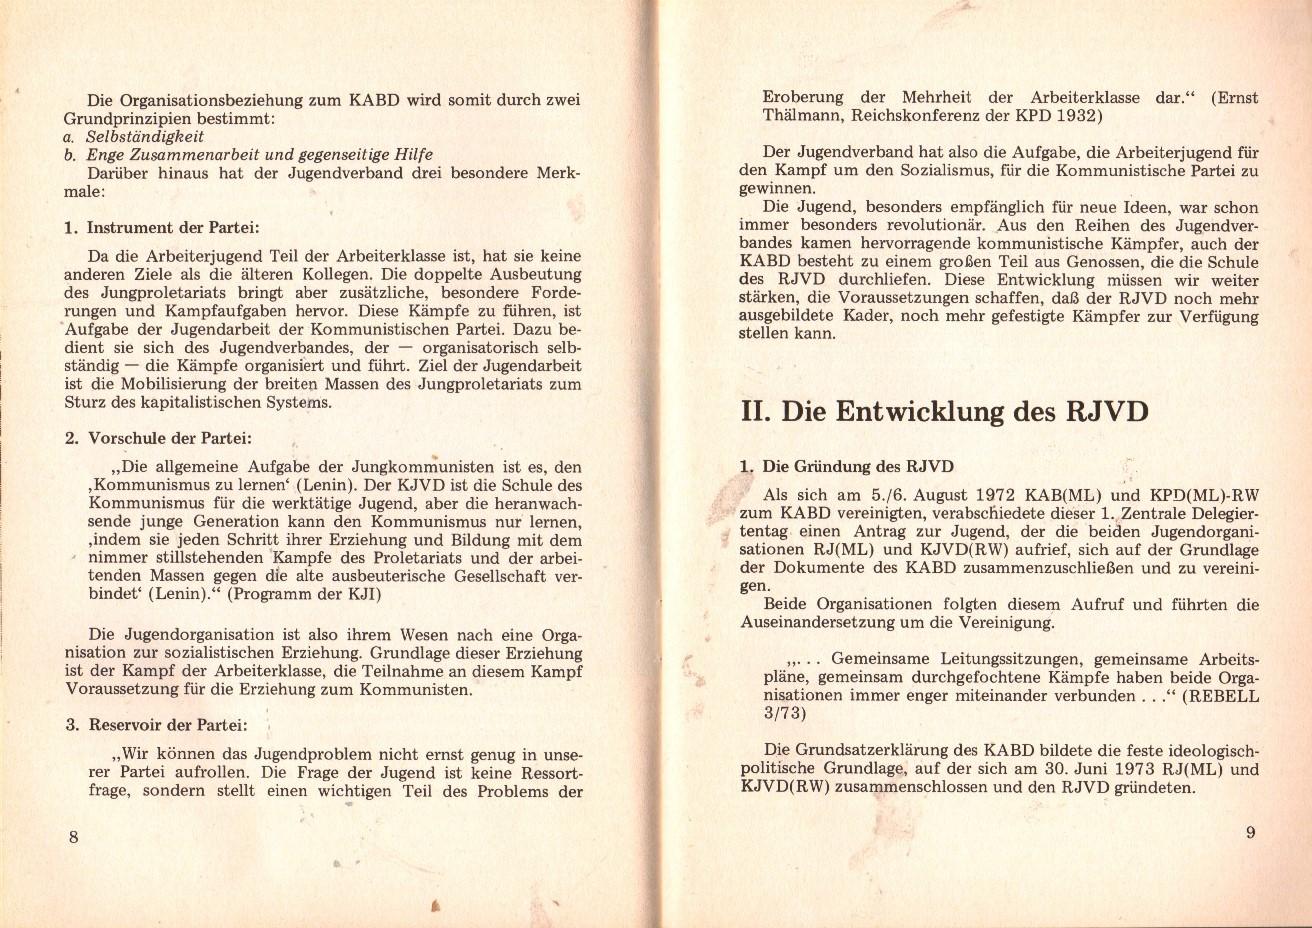 KABD_1977_Jugend_Zukunft_07